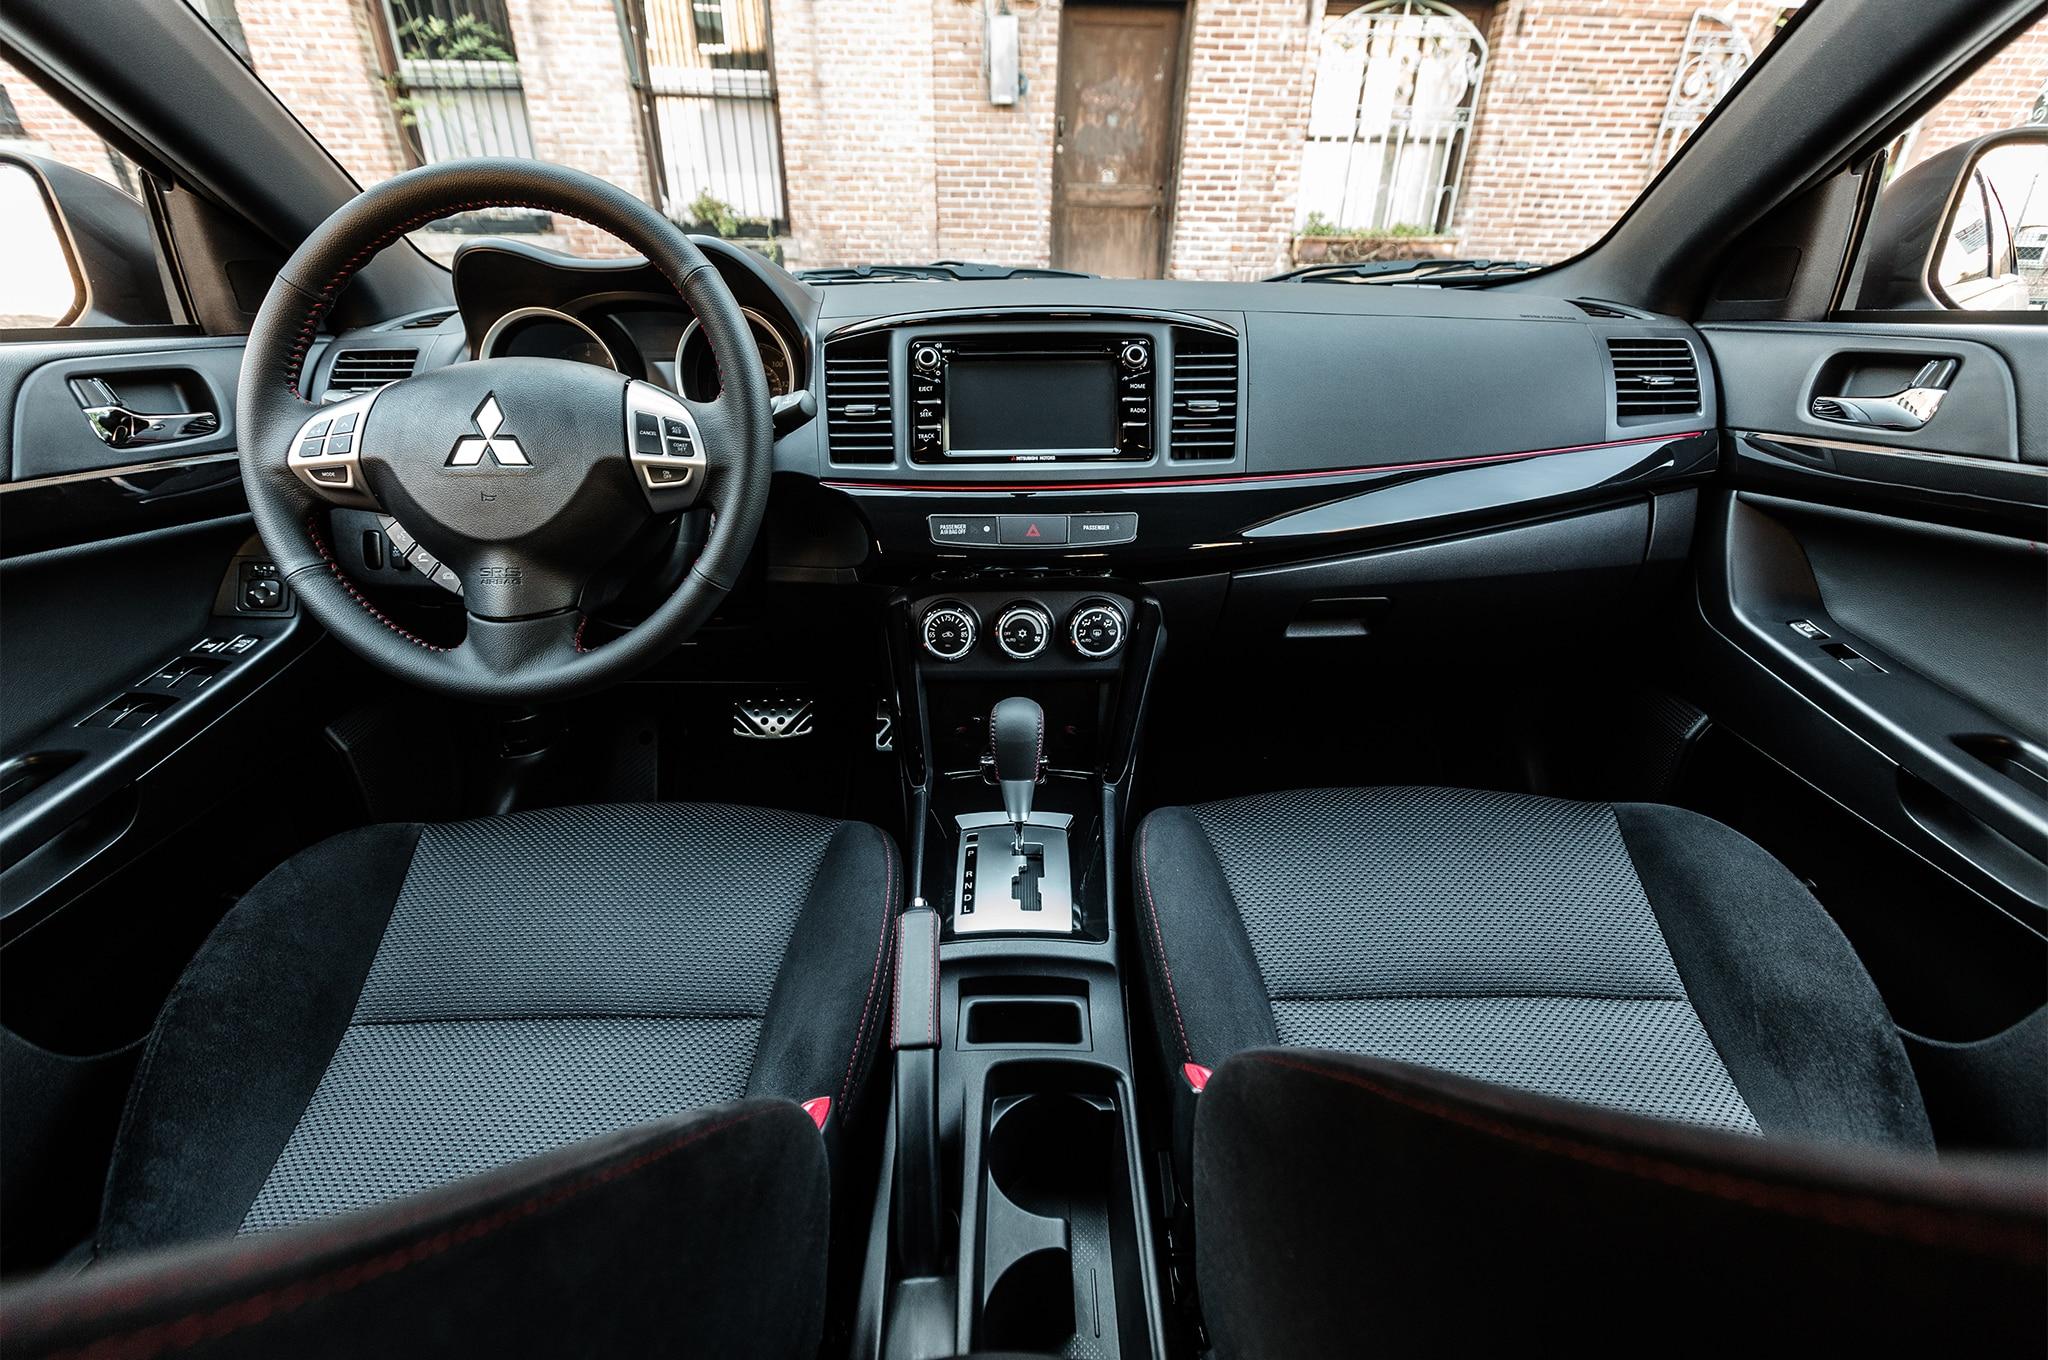 2017 Mitsubishi Lancer Limited Edition cabin